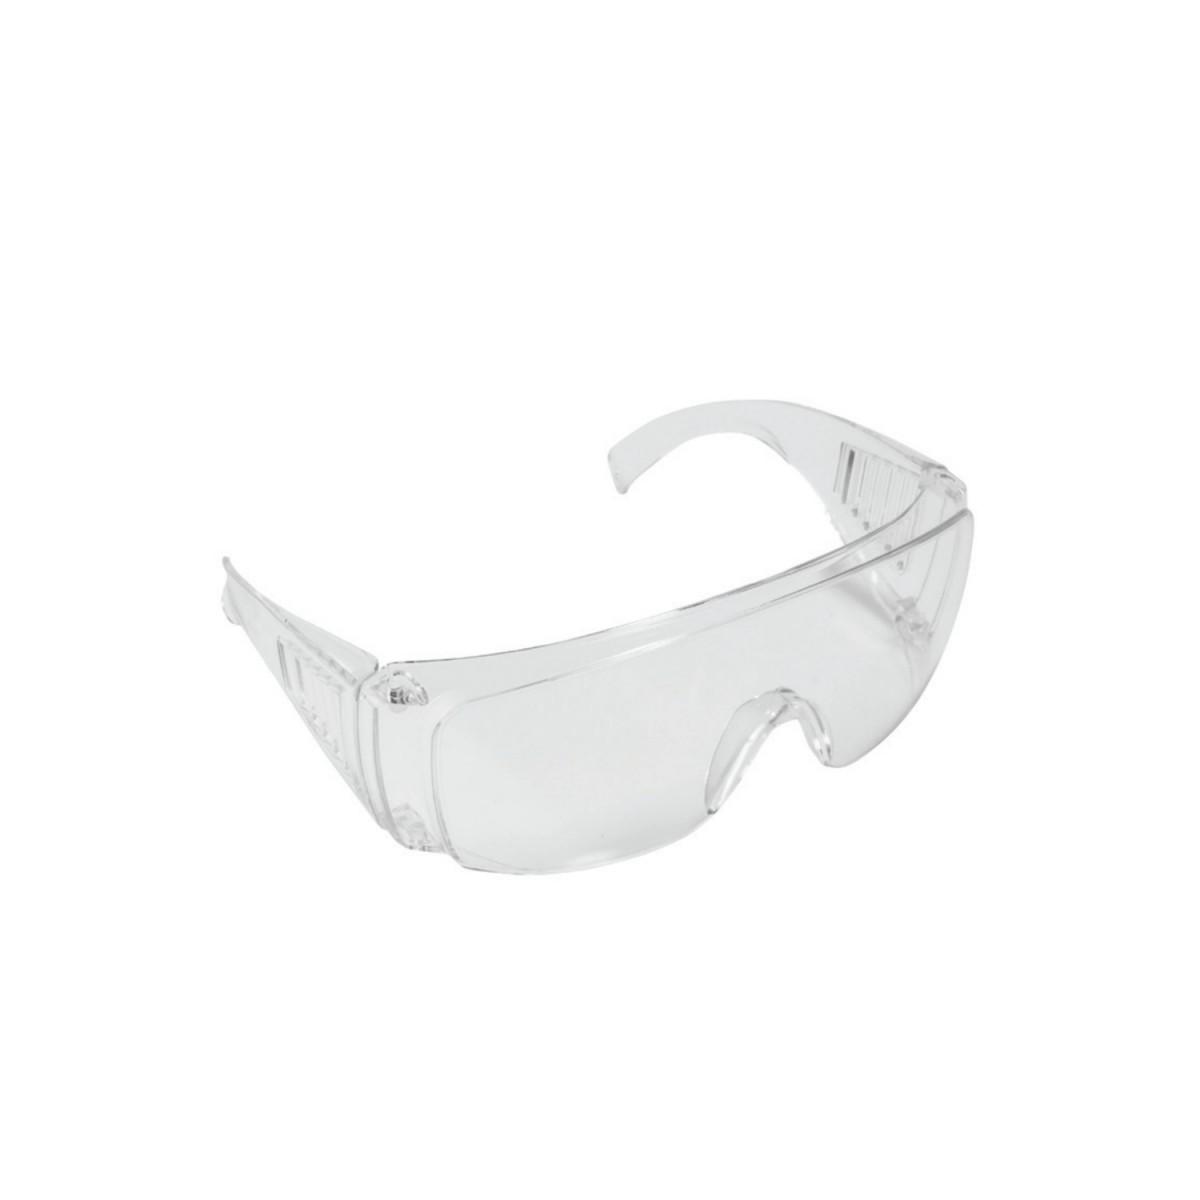 Okulary ochronne DEDRA - BH1050 Okulary ochronne DEDRA - BH1050